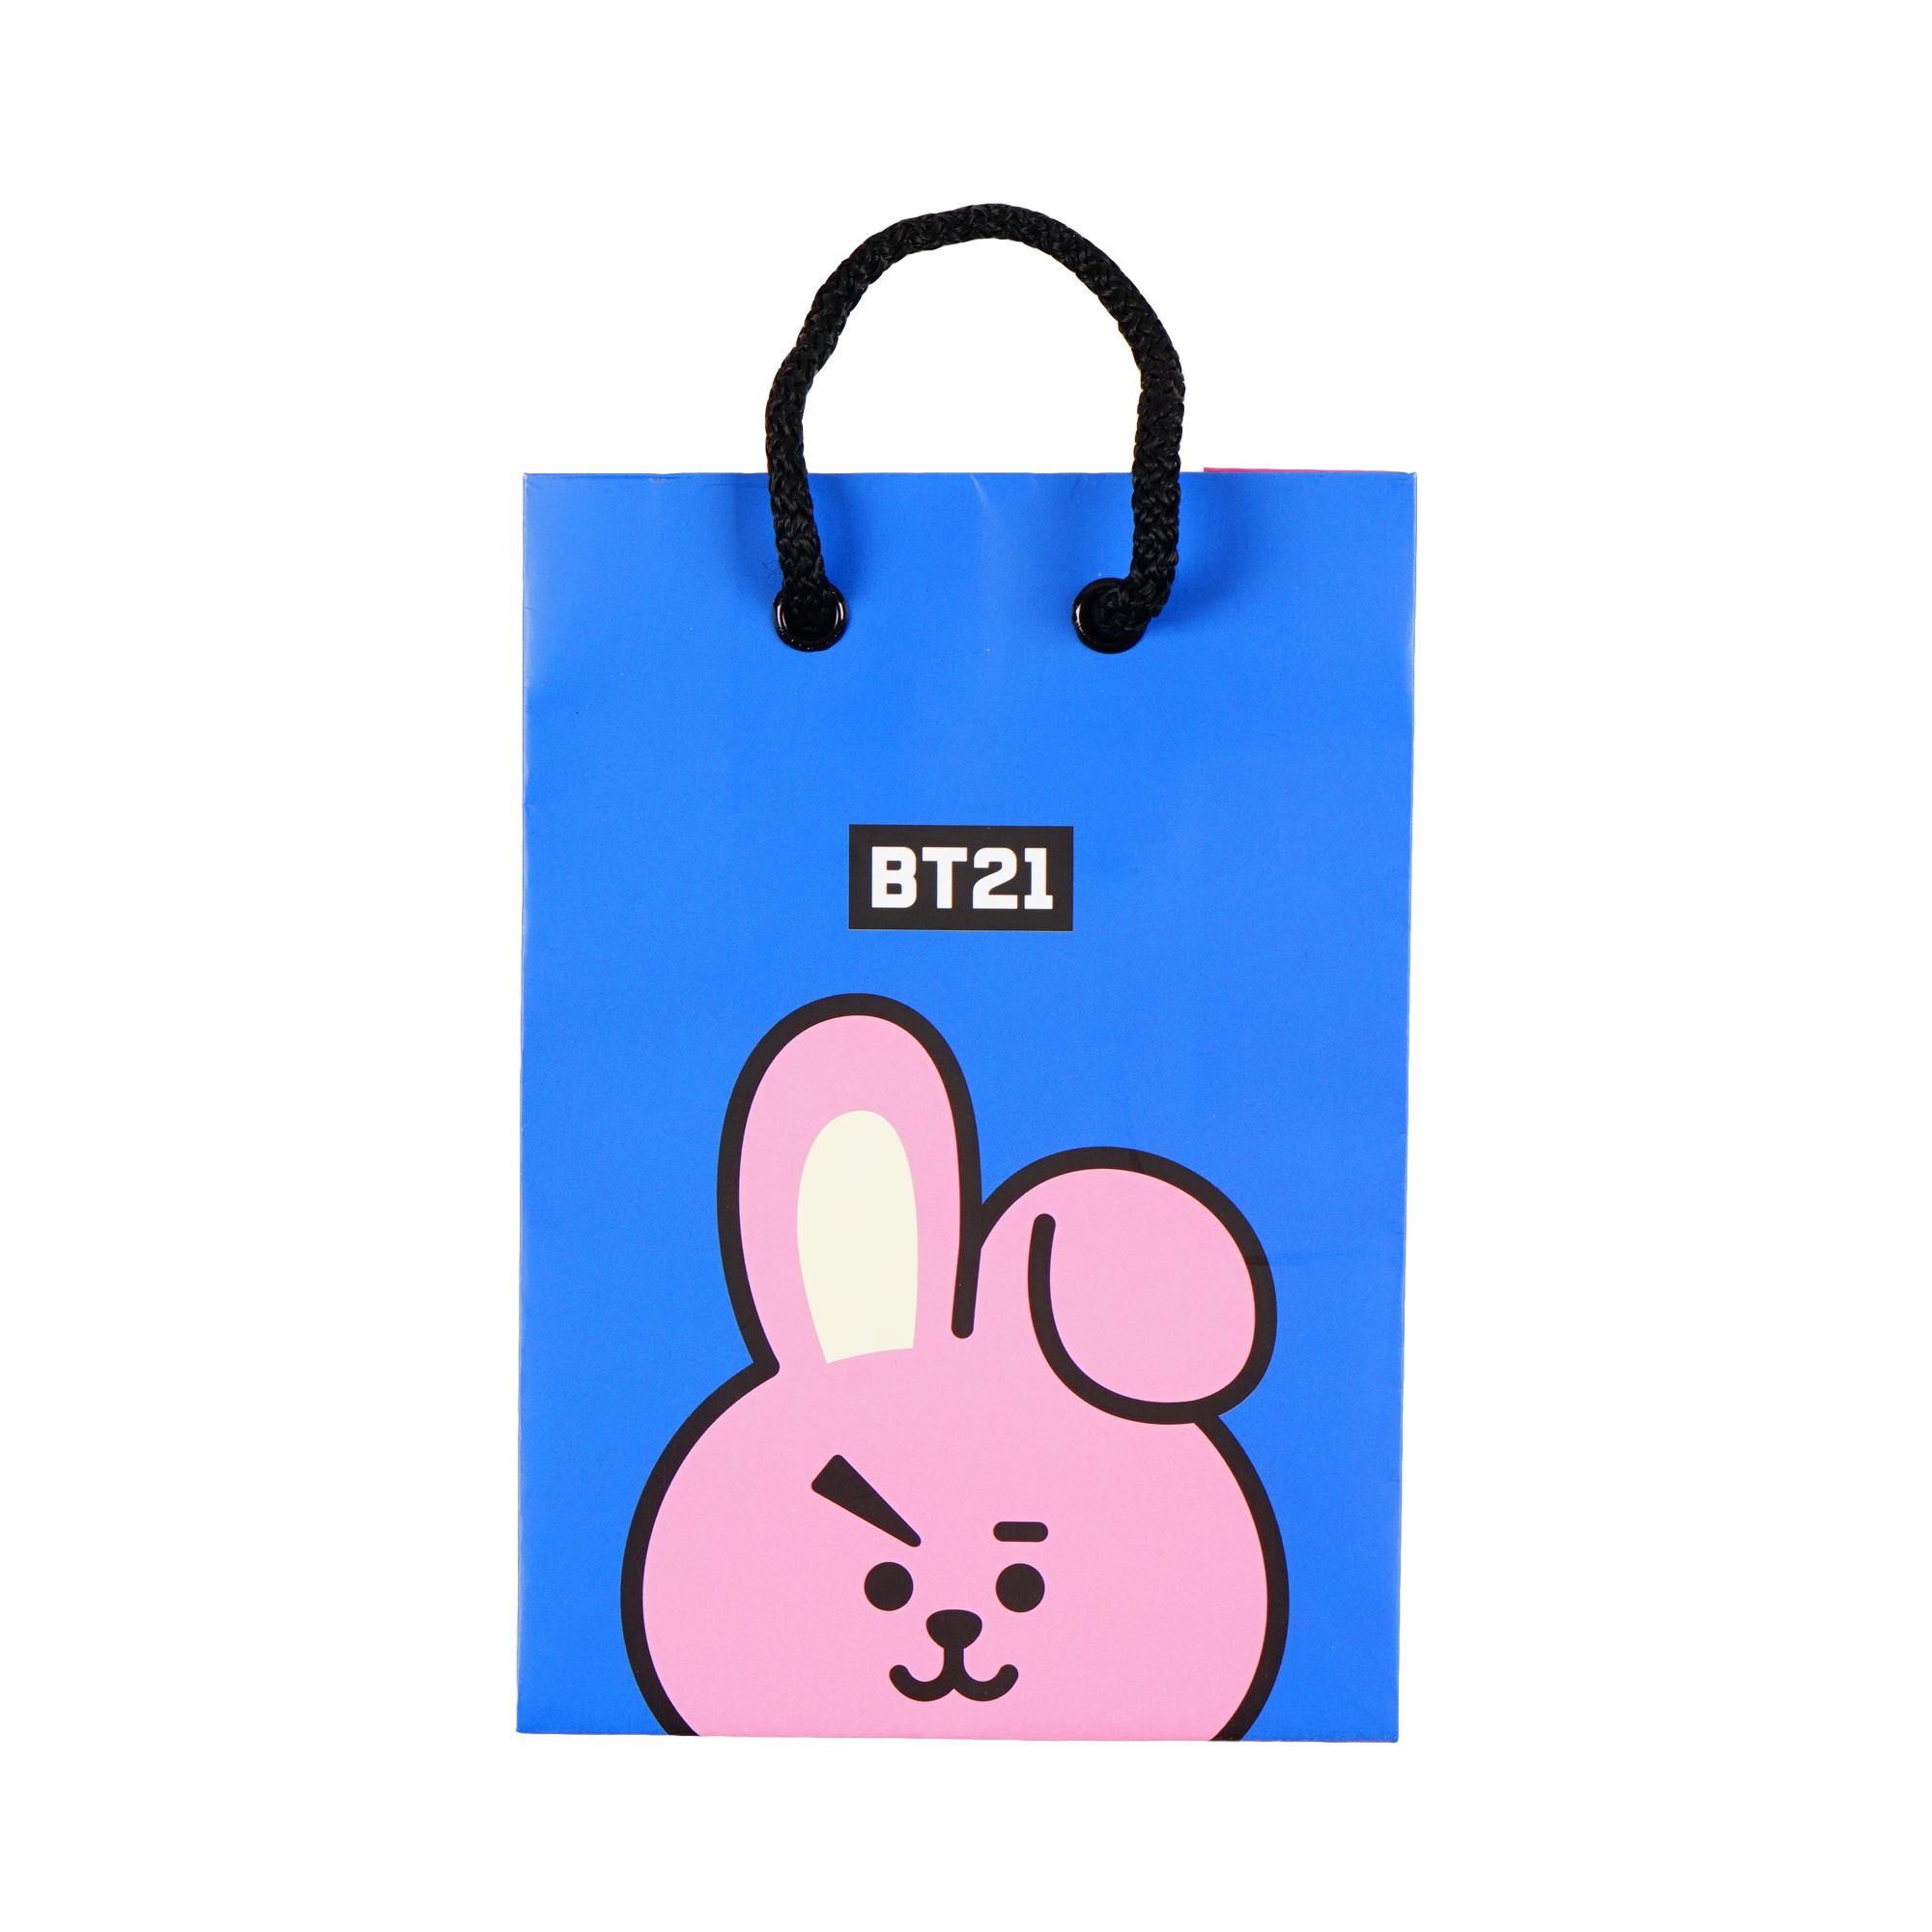 BT21 COOKY 기프트 쇼핑백 (Small)